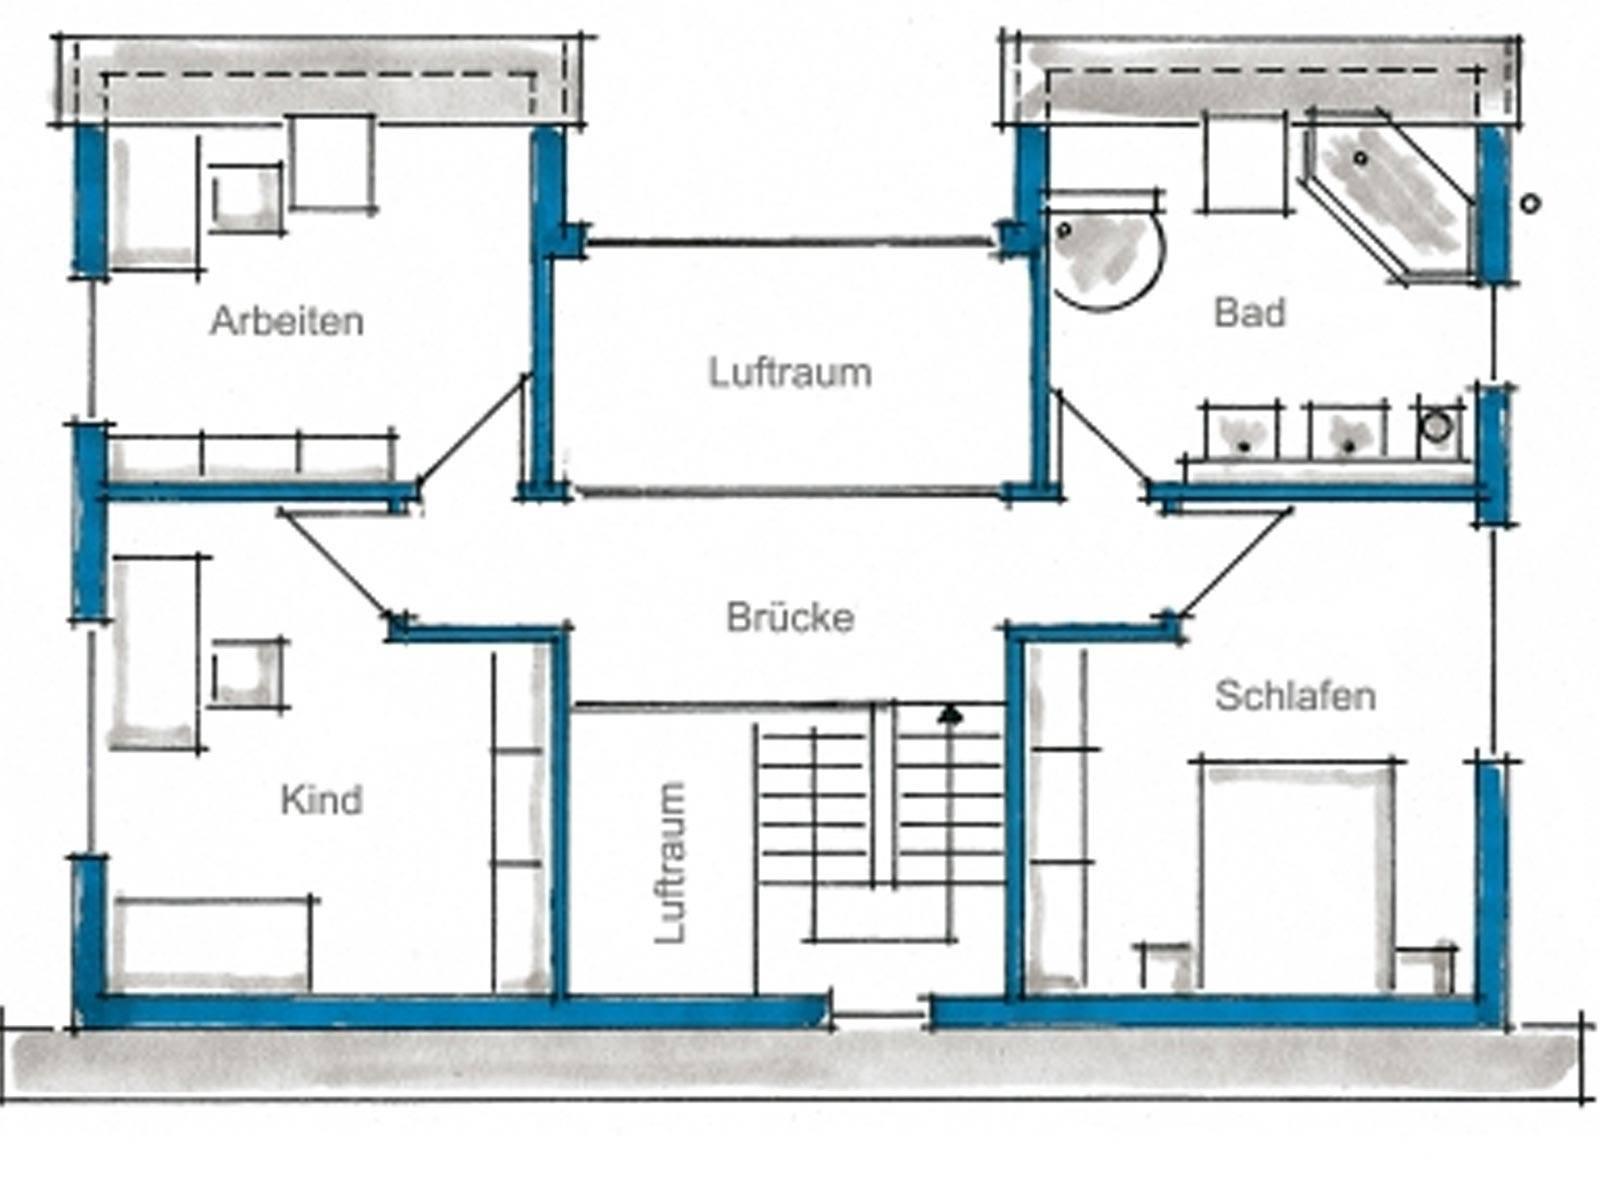 pultdachhaus achilles fertighaus weiss. Black Bedroom Furniture Sets. Home Design Ideas